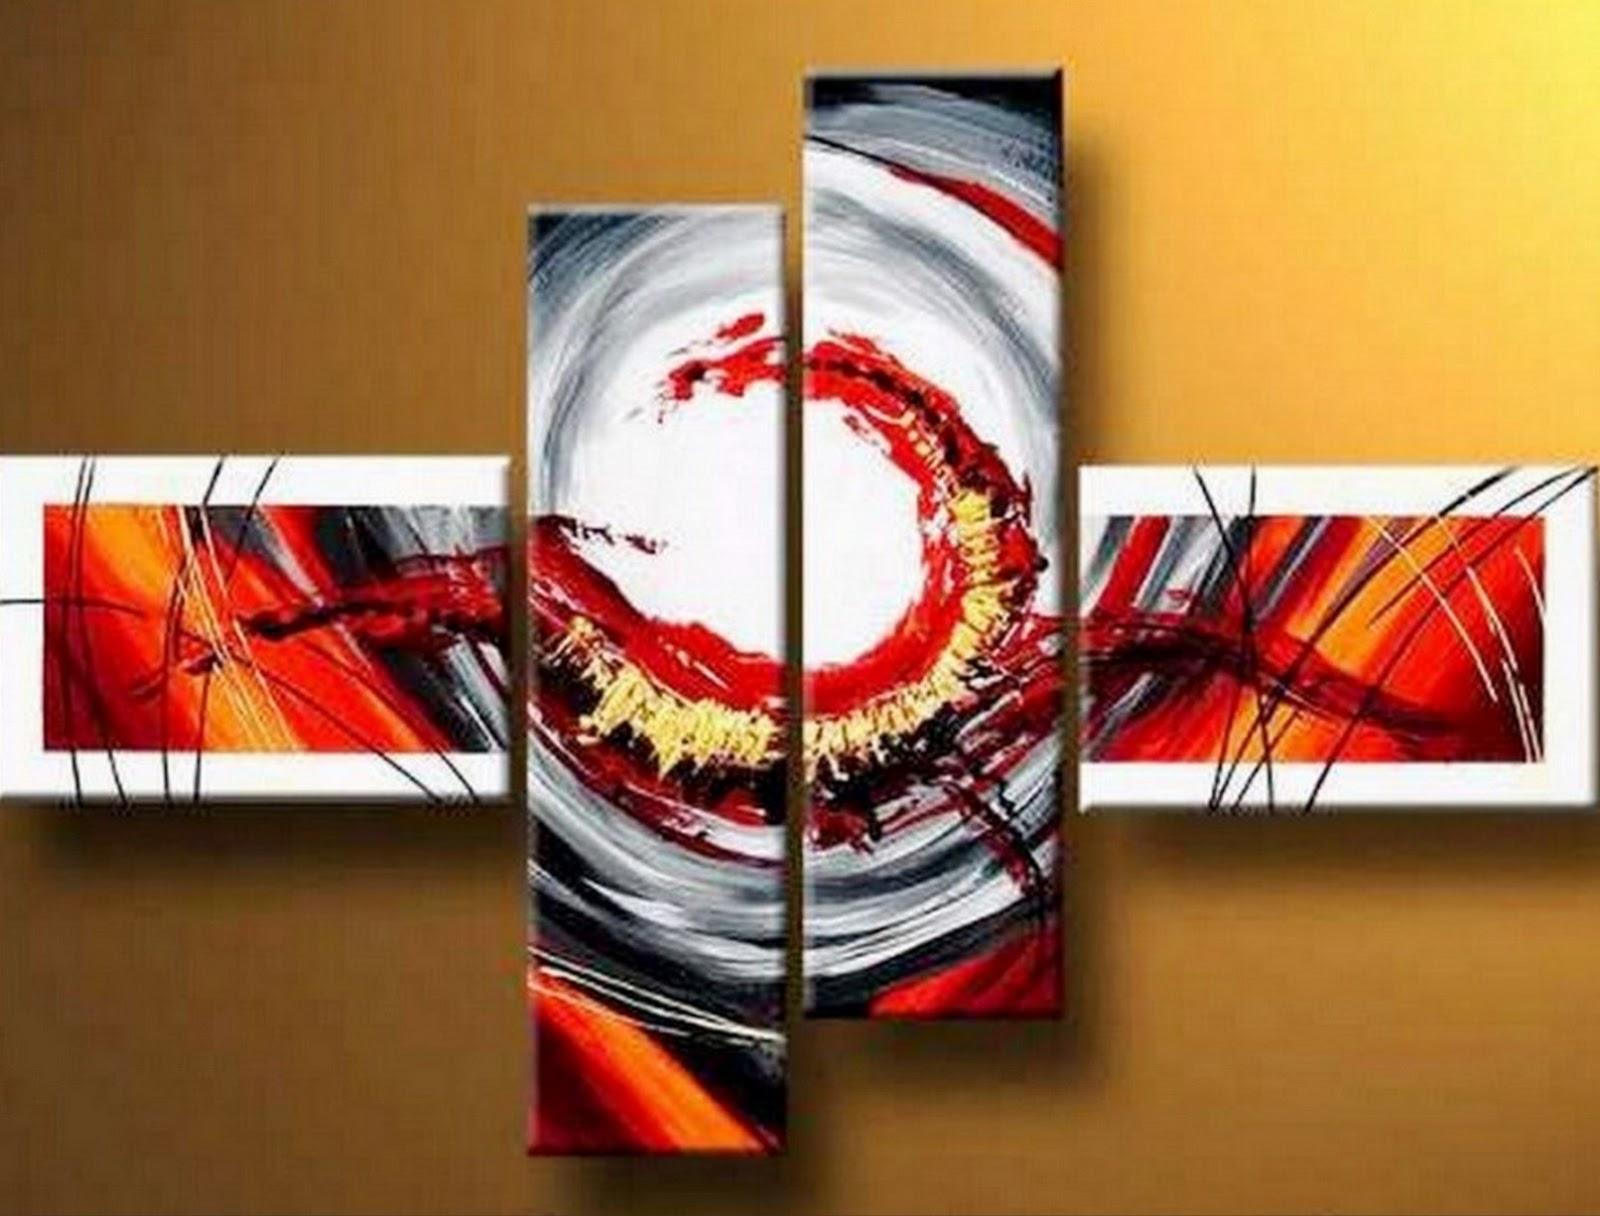 Decoraci n de casa u oficina cuadros abstractos modernos for Tendencia en cuadros decorativos 2016